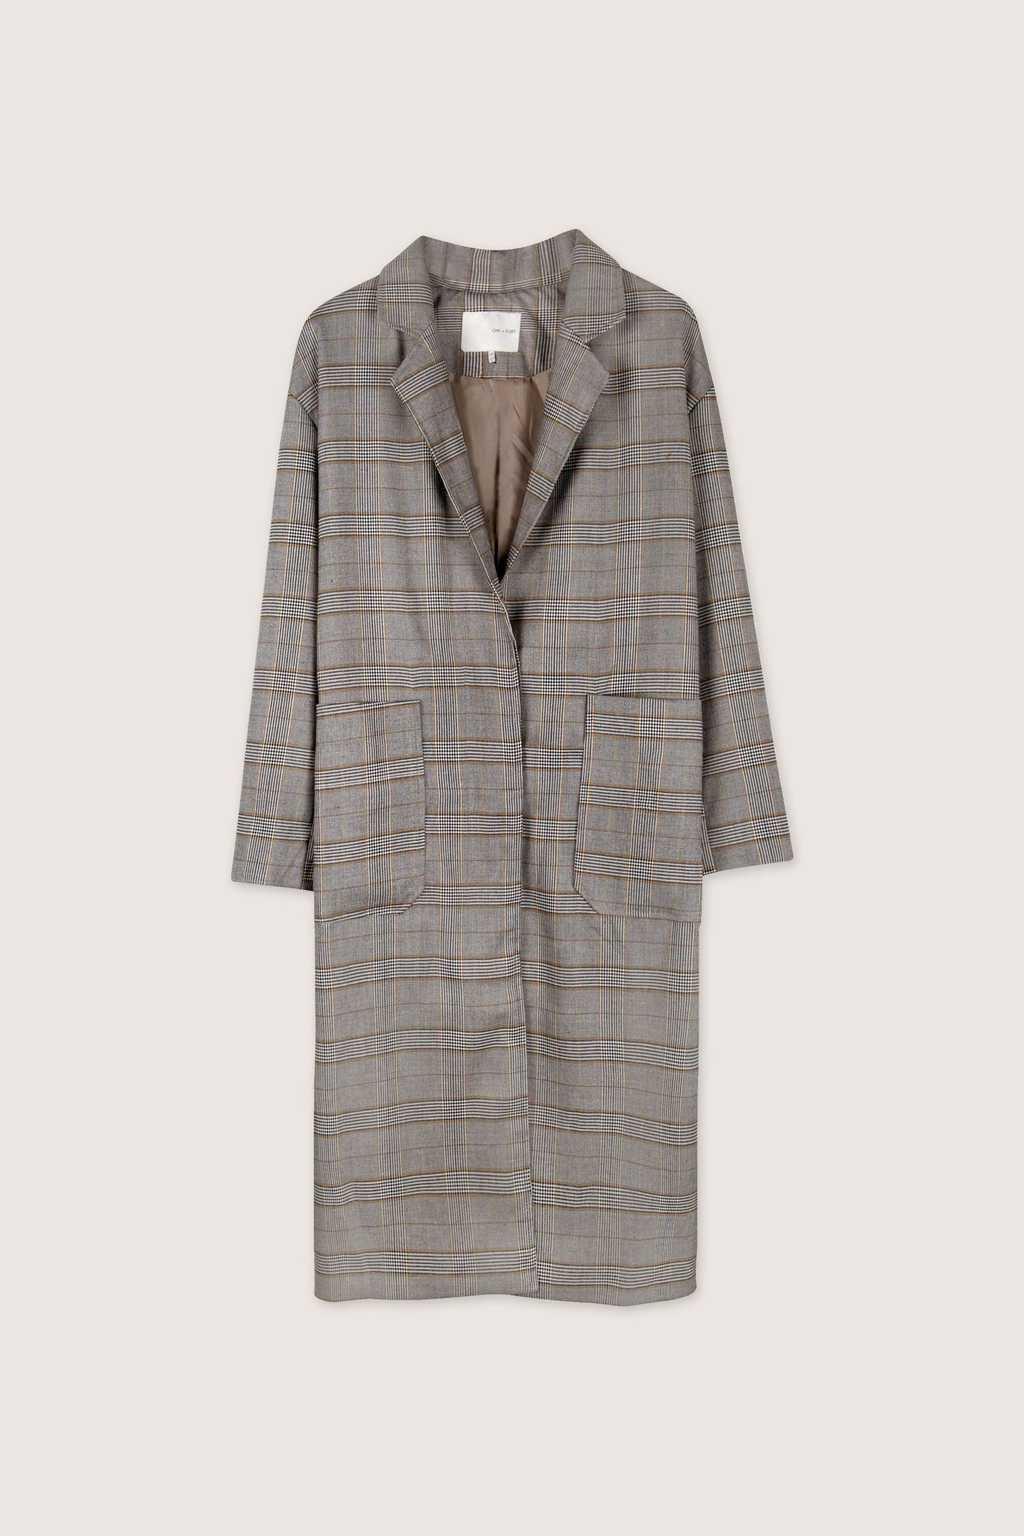 Coat H036 Gray 10